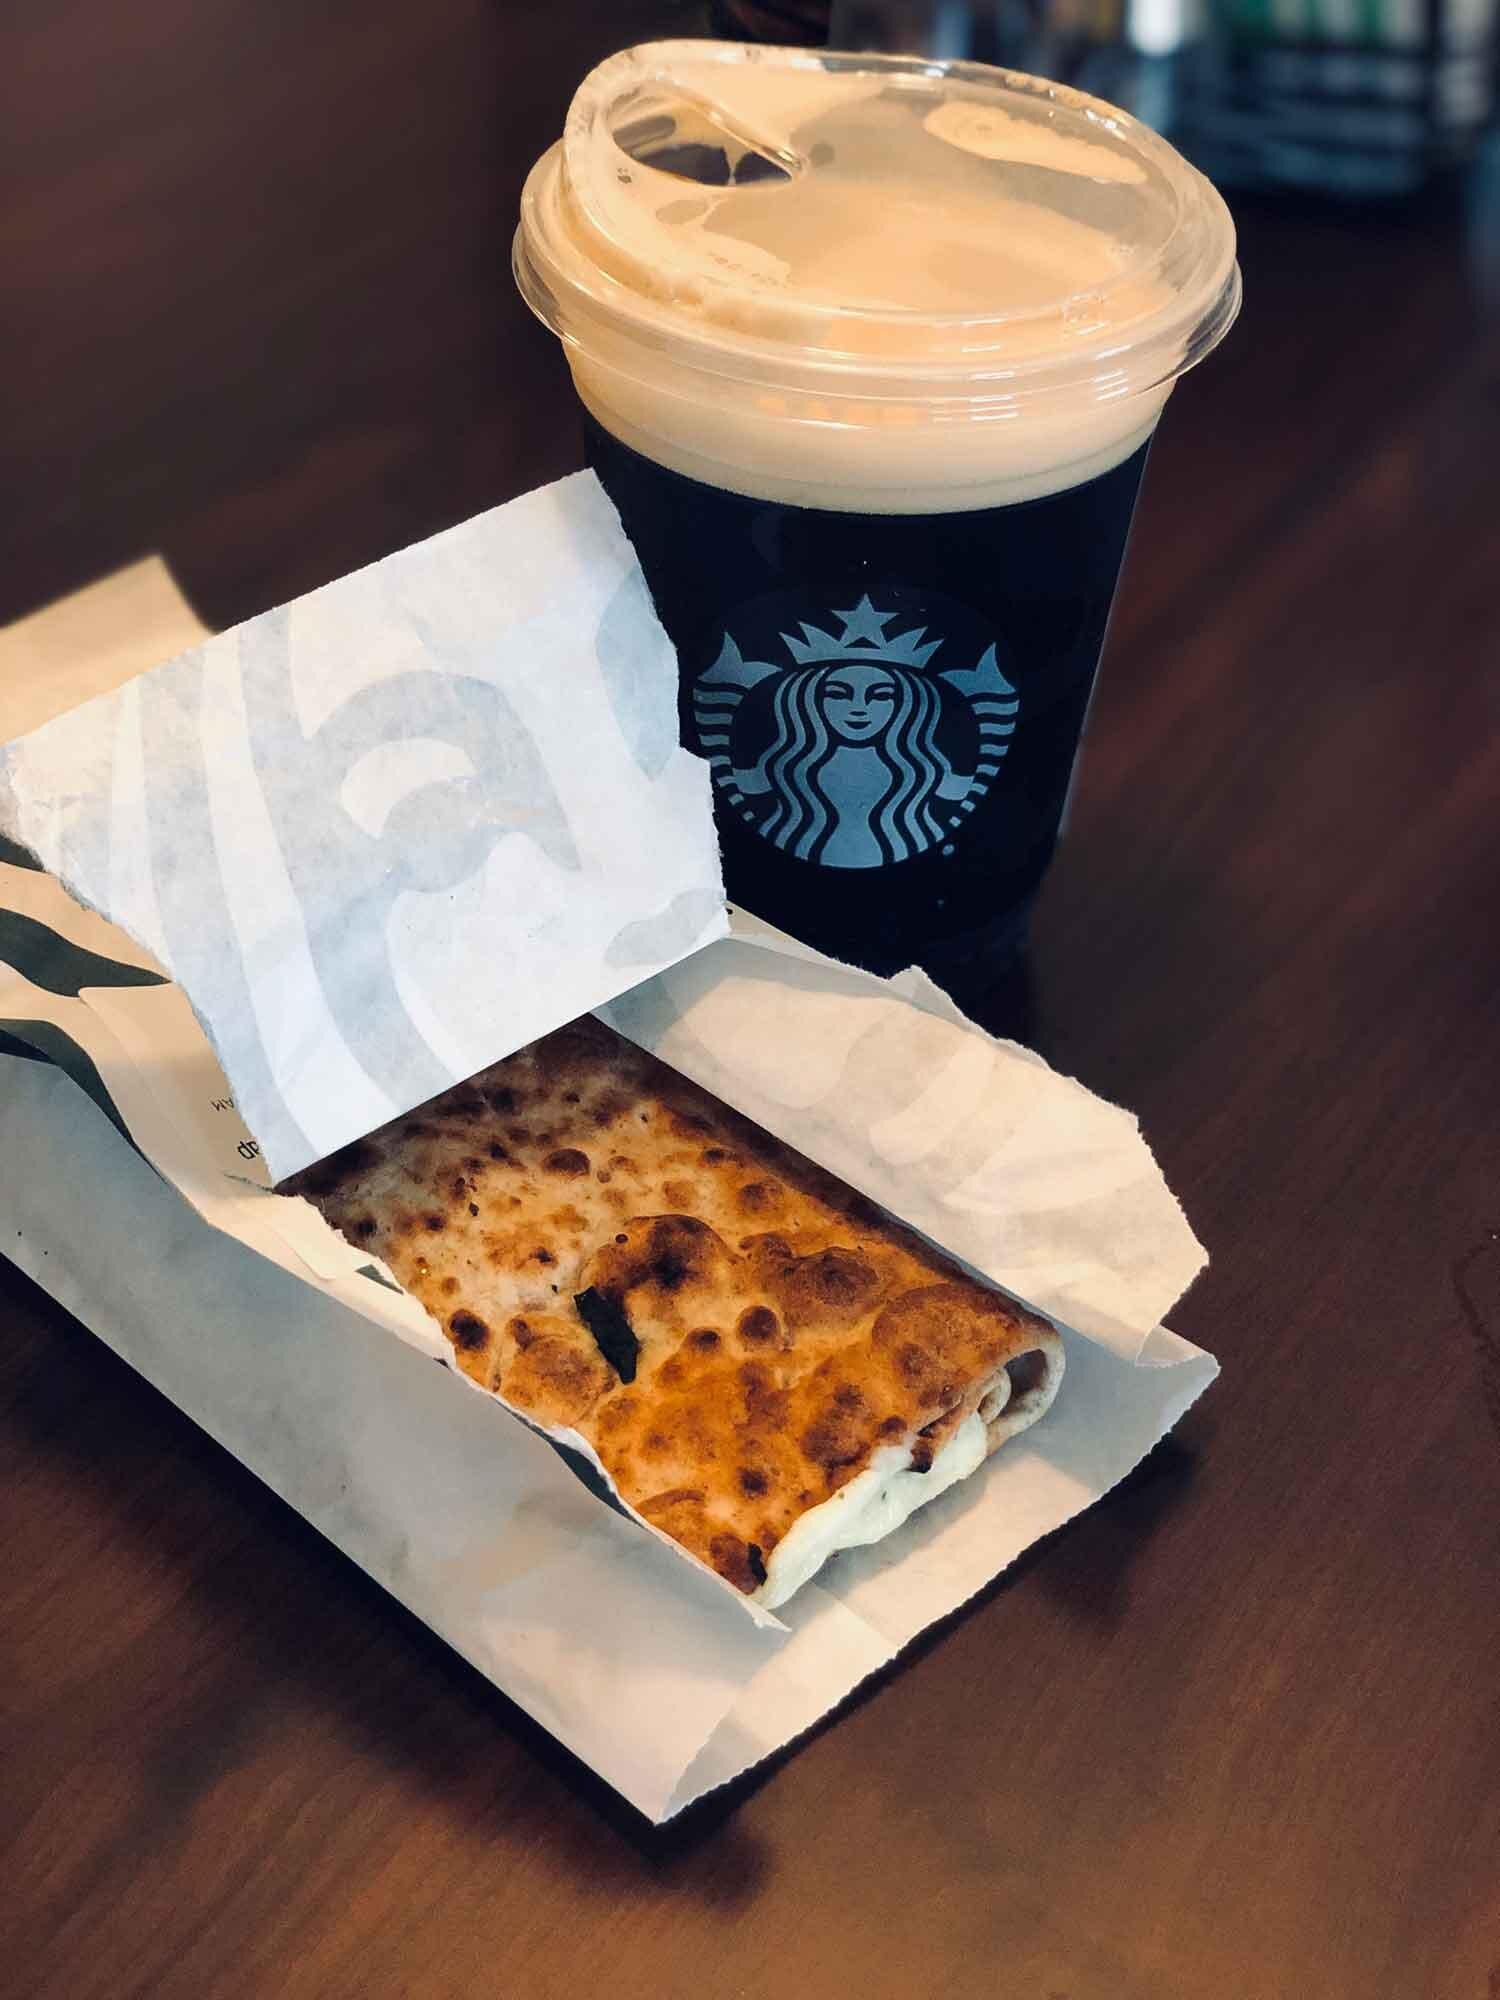 Healthy Starbucks breakfast spinach wrap and Nitro cold brew black coffee